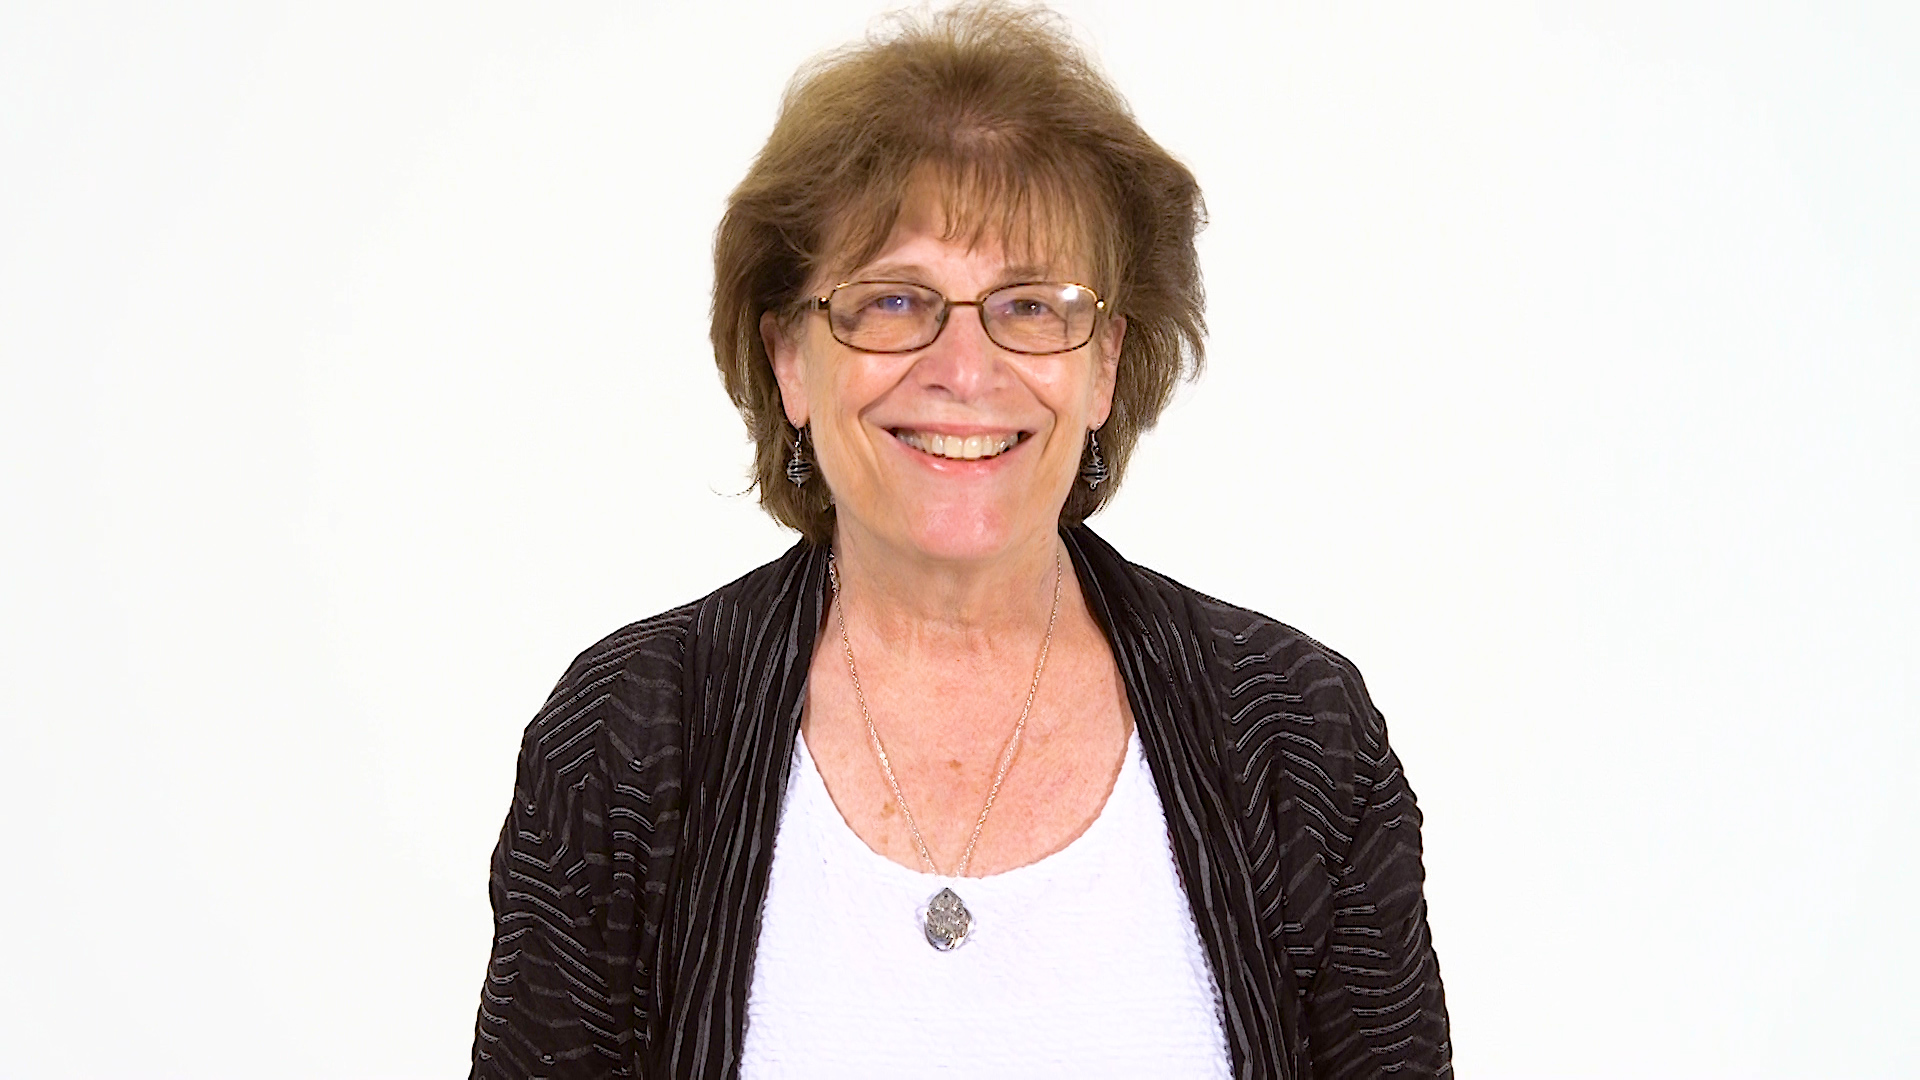 Nadine Martin, PhD, CCC-SLP